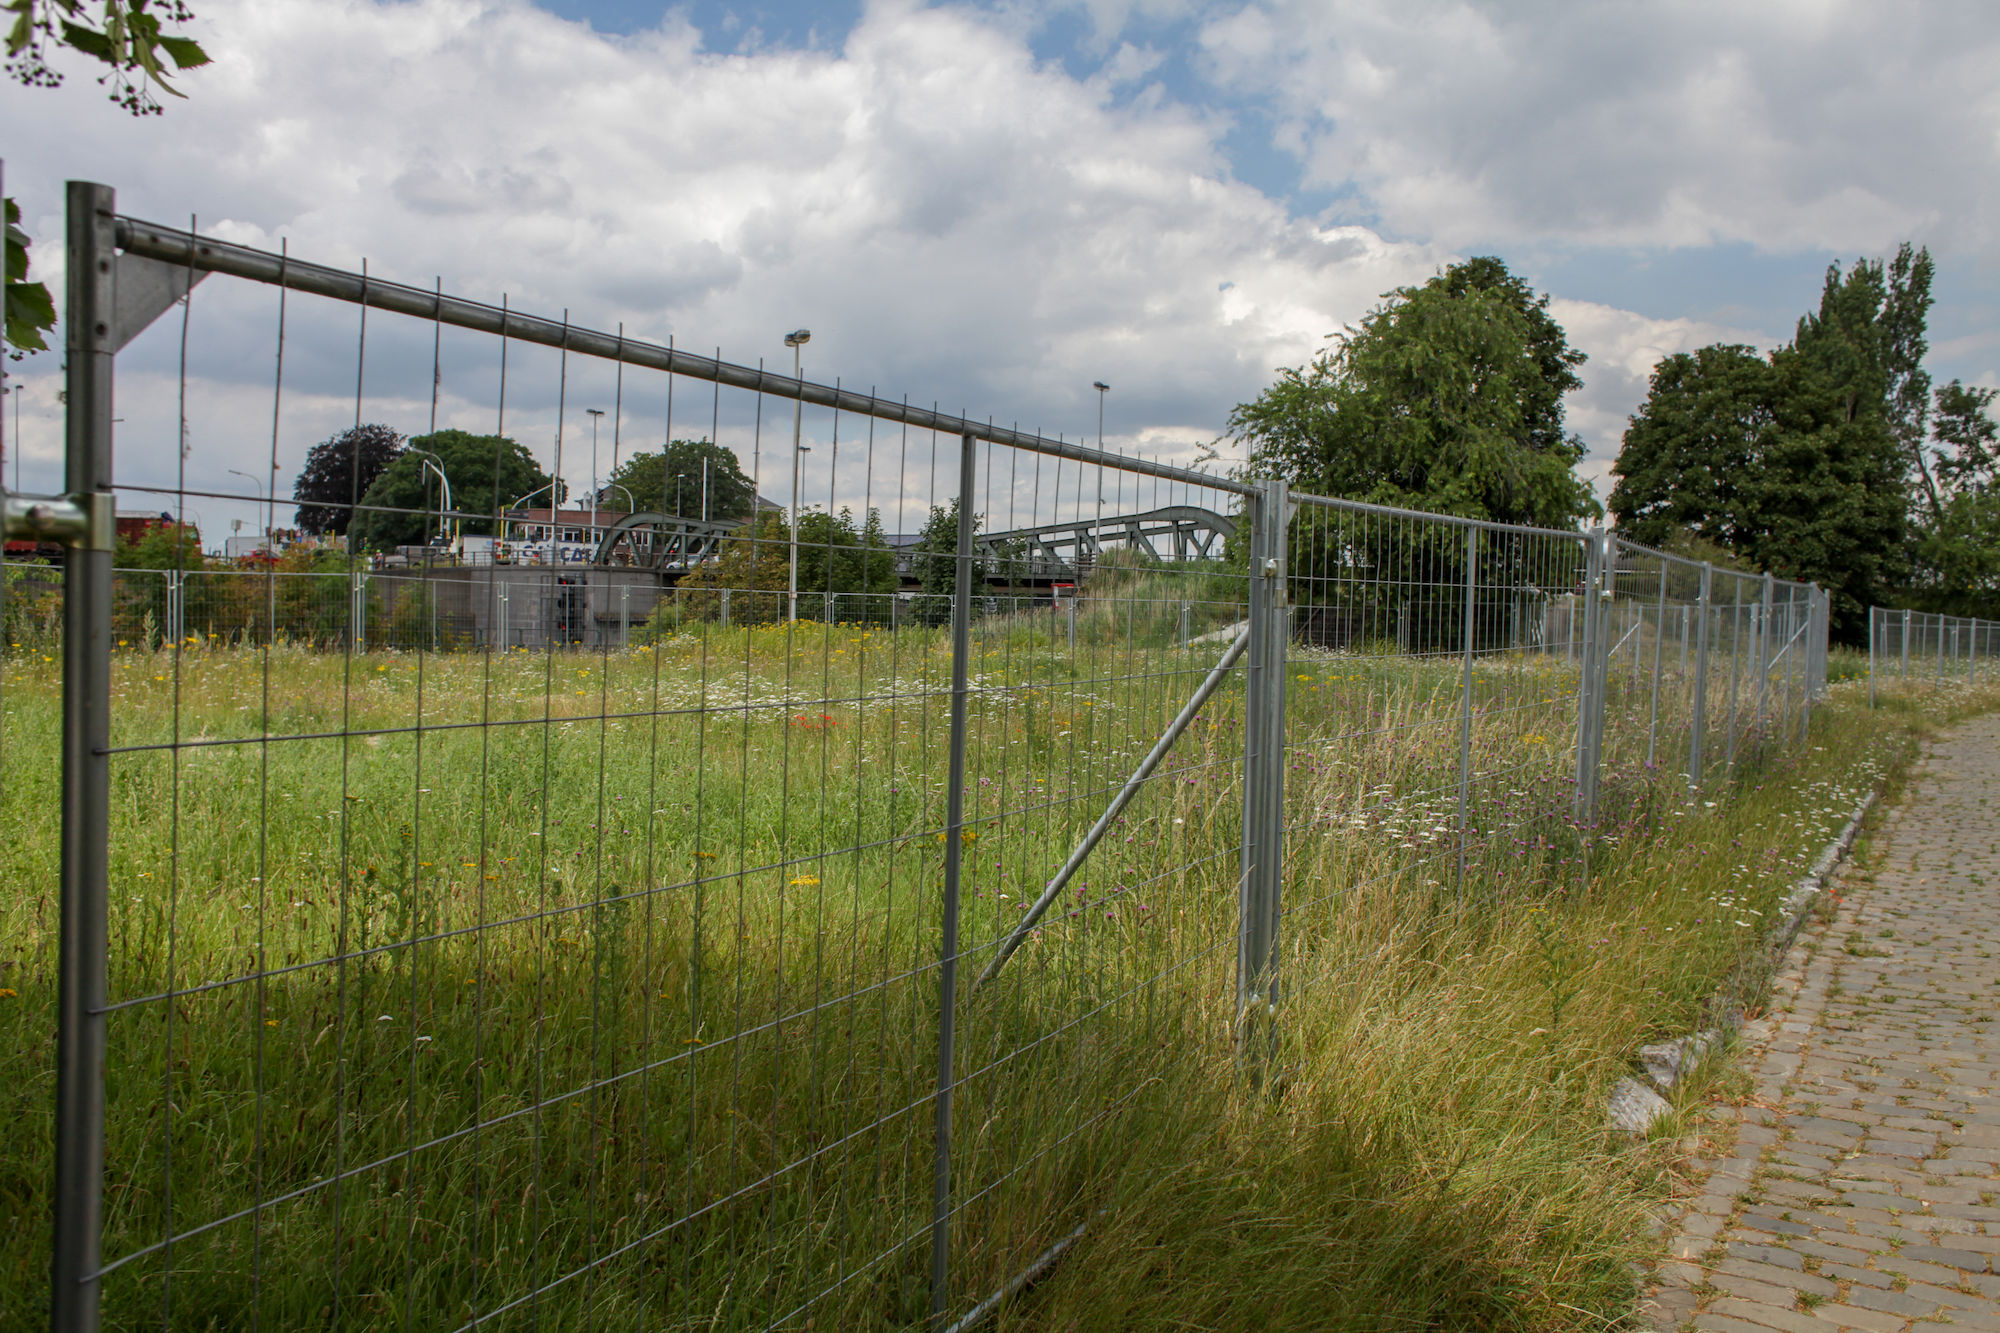 2019-07-02 Muide Meulestede prospectie Wannes_stadsvernieuwing_IMG_0365-3.jpg